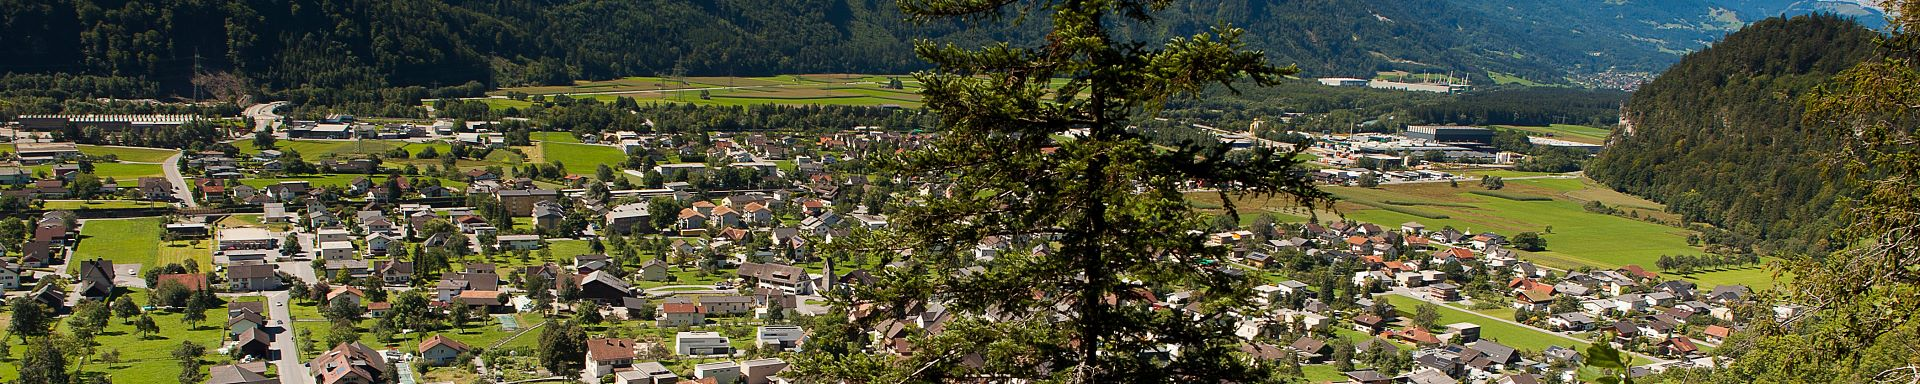 Nziders - Alpenregion Bludenz